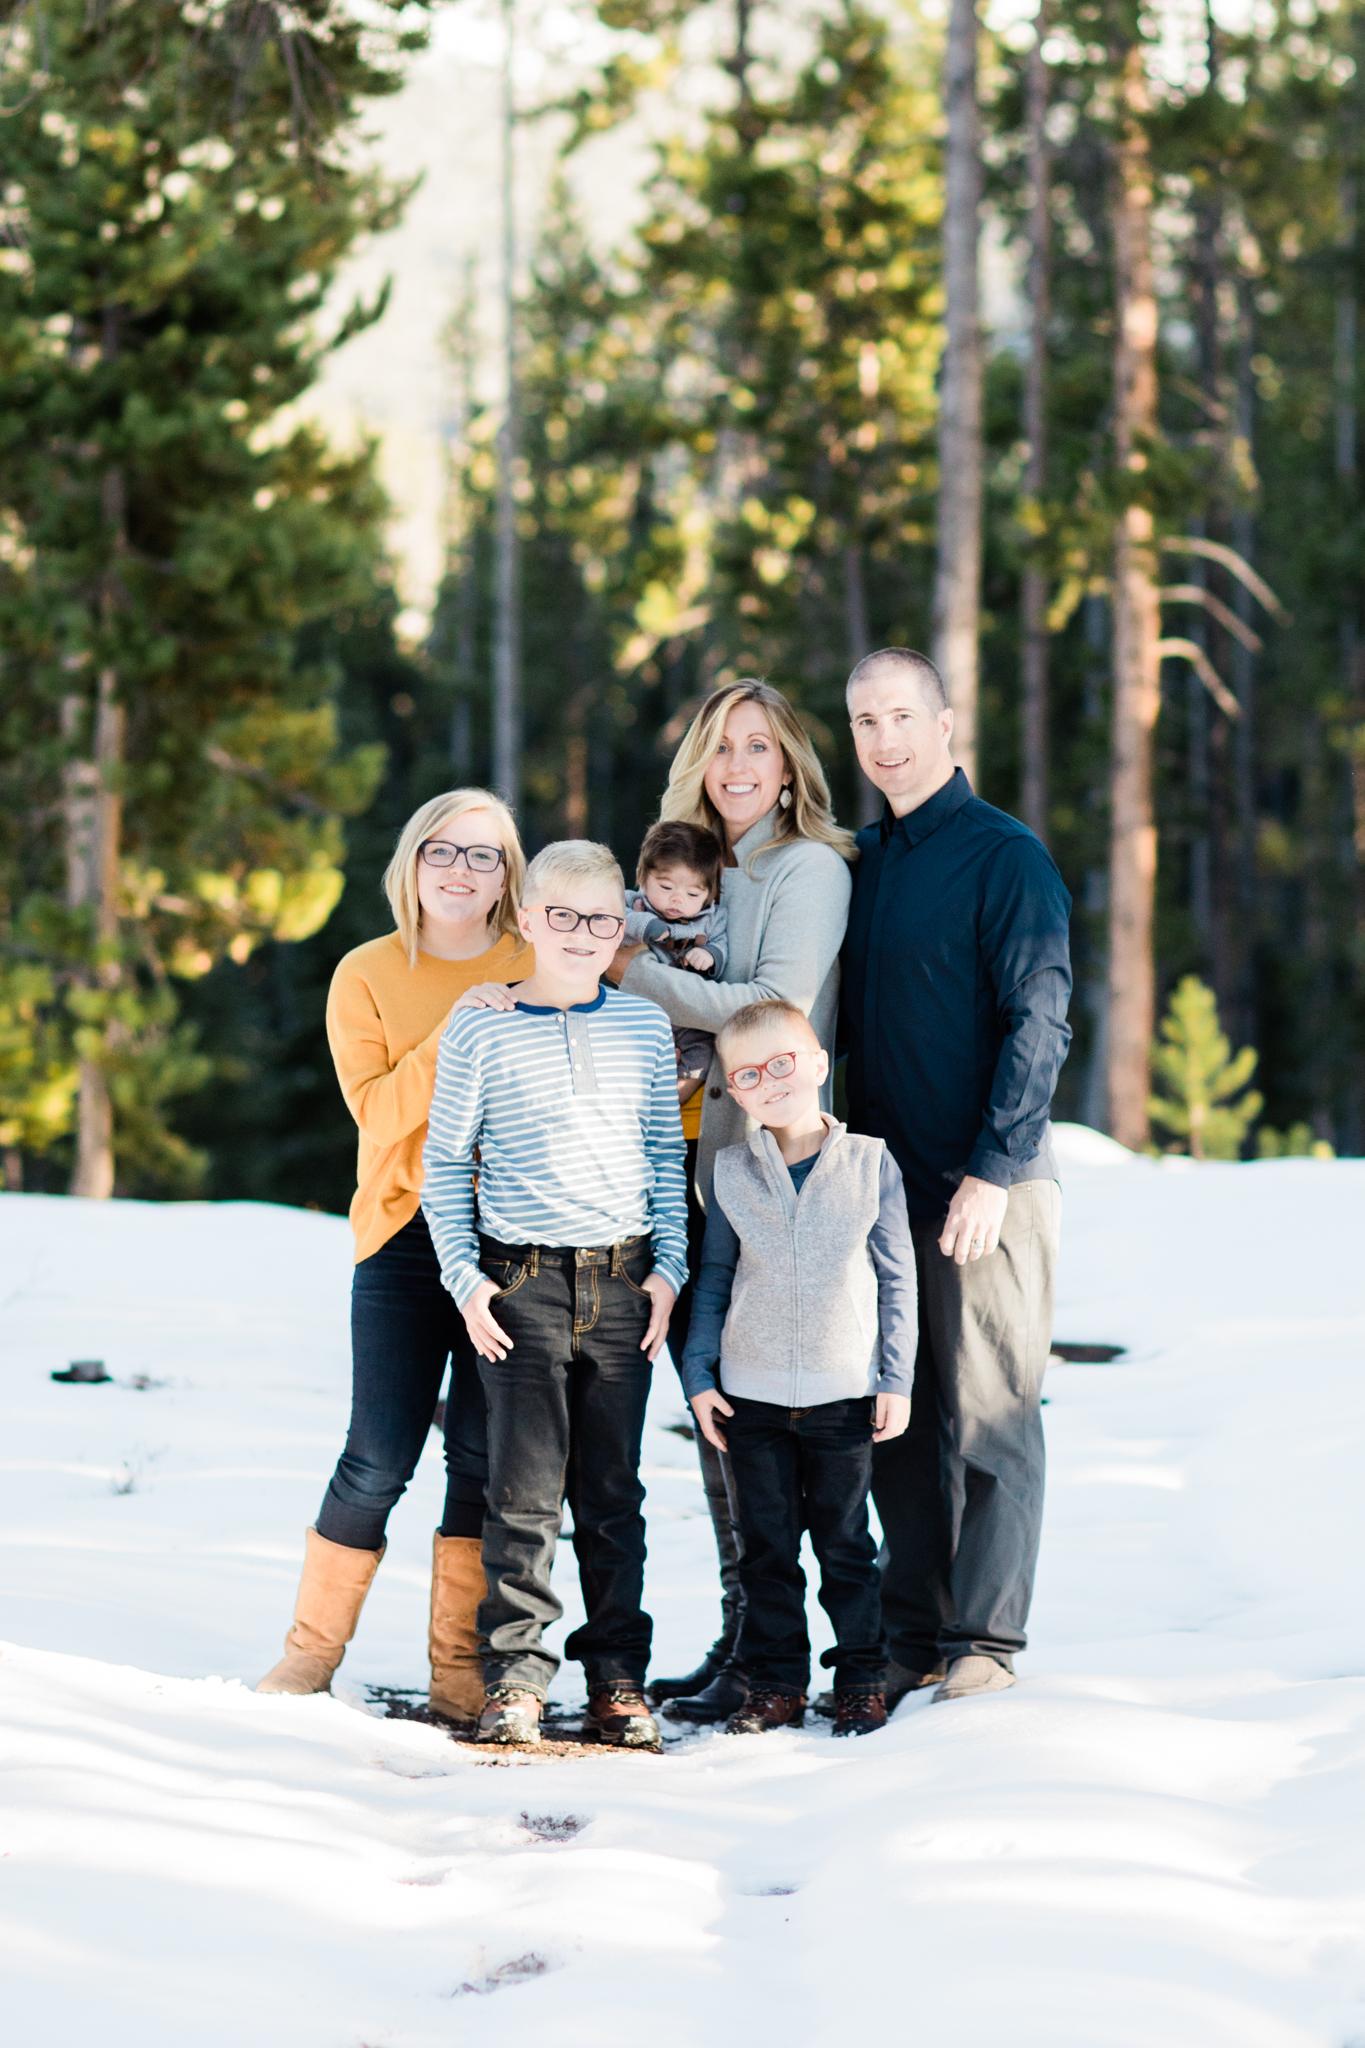 King Family Breckenridge, CO